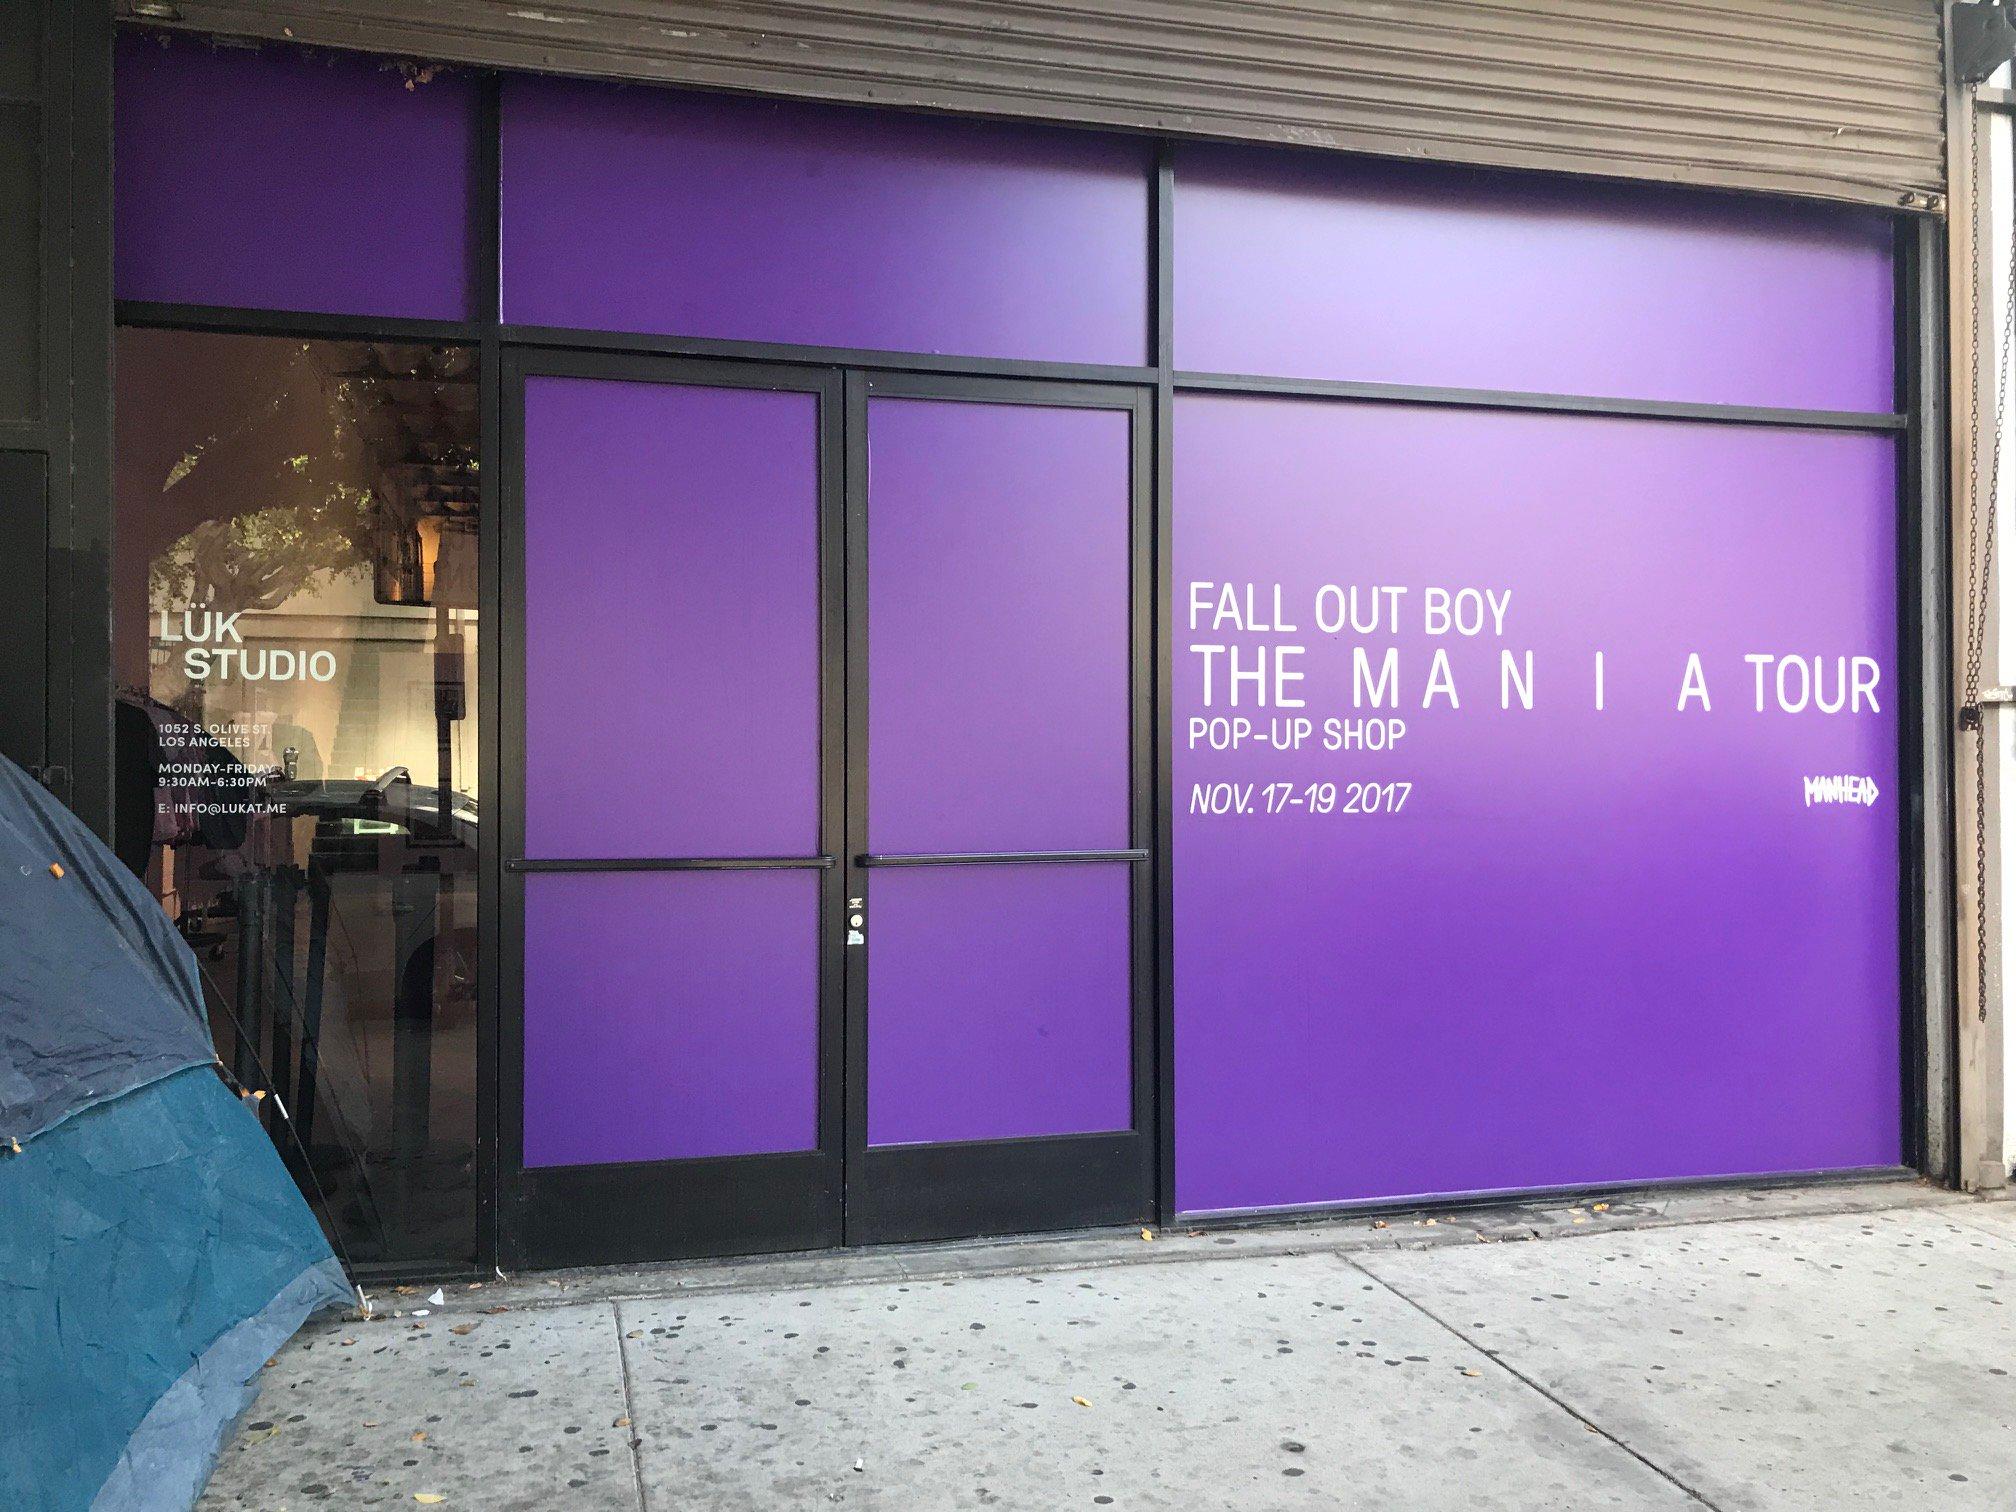 LA pop up shop is open for business! Come on down and get your M A  N   I    A merch https://t.co/g18ZwMgXUd